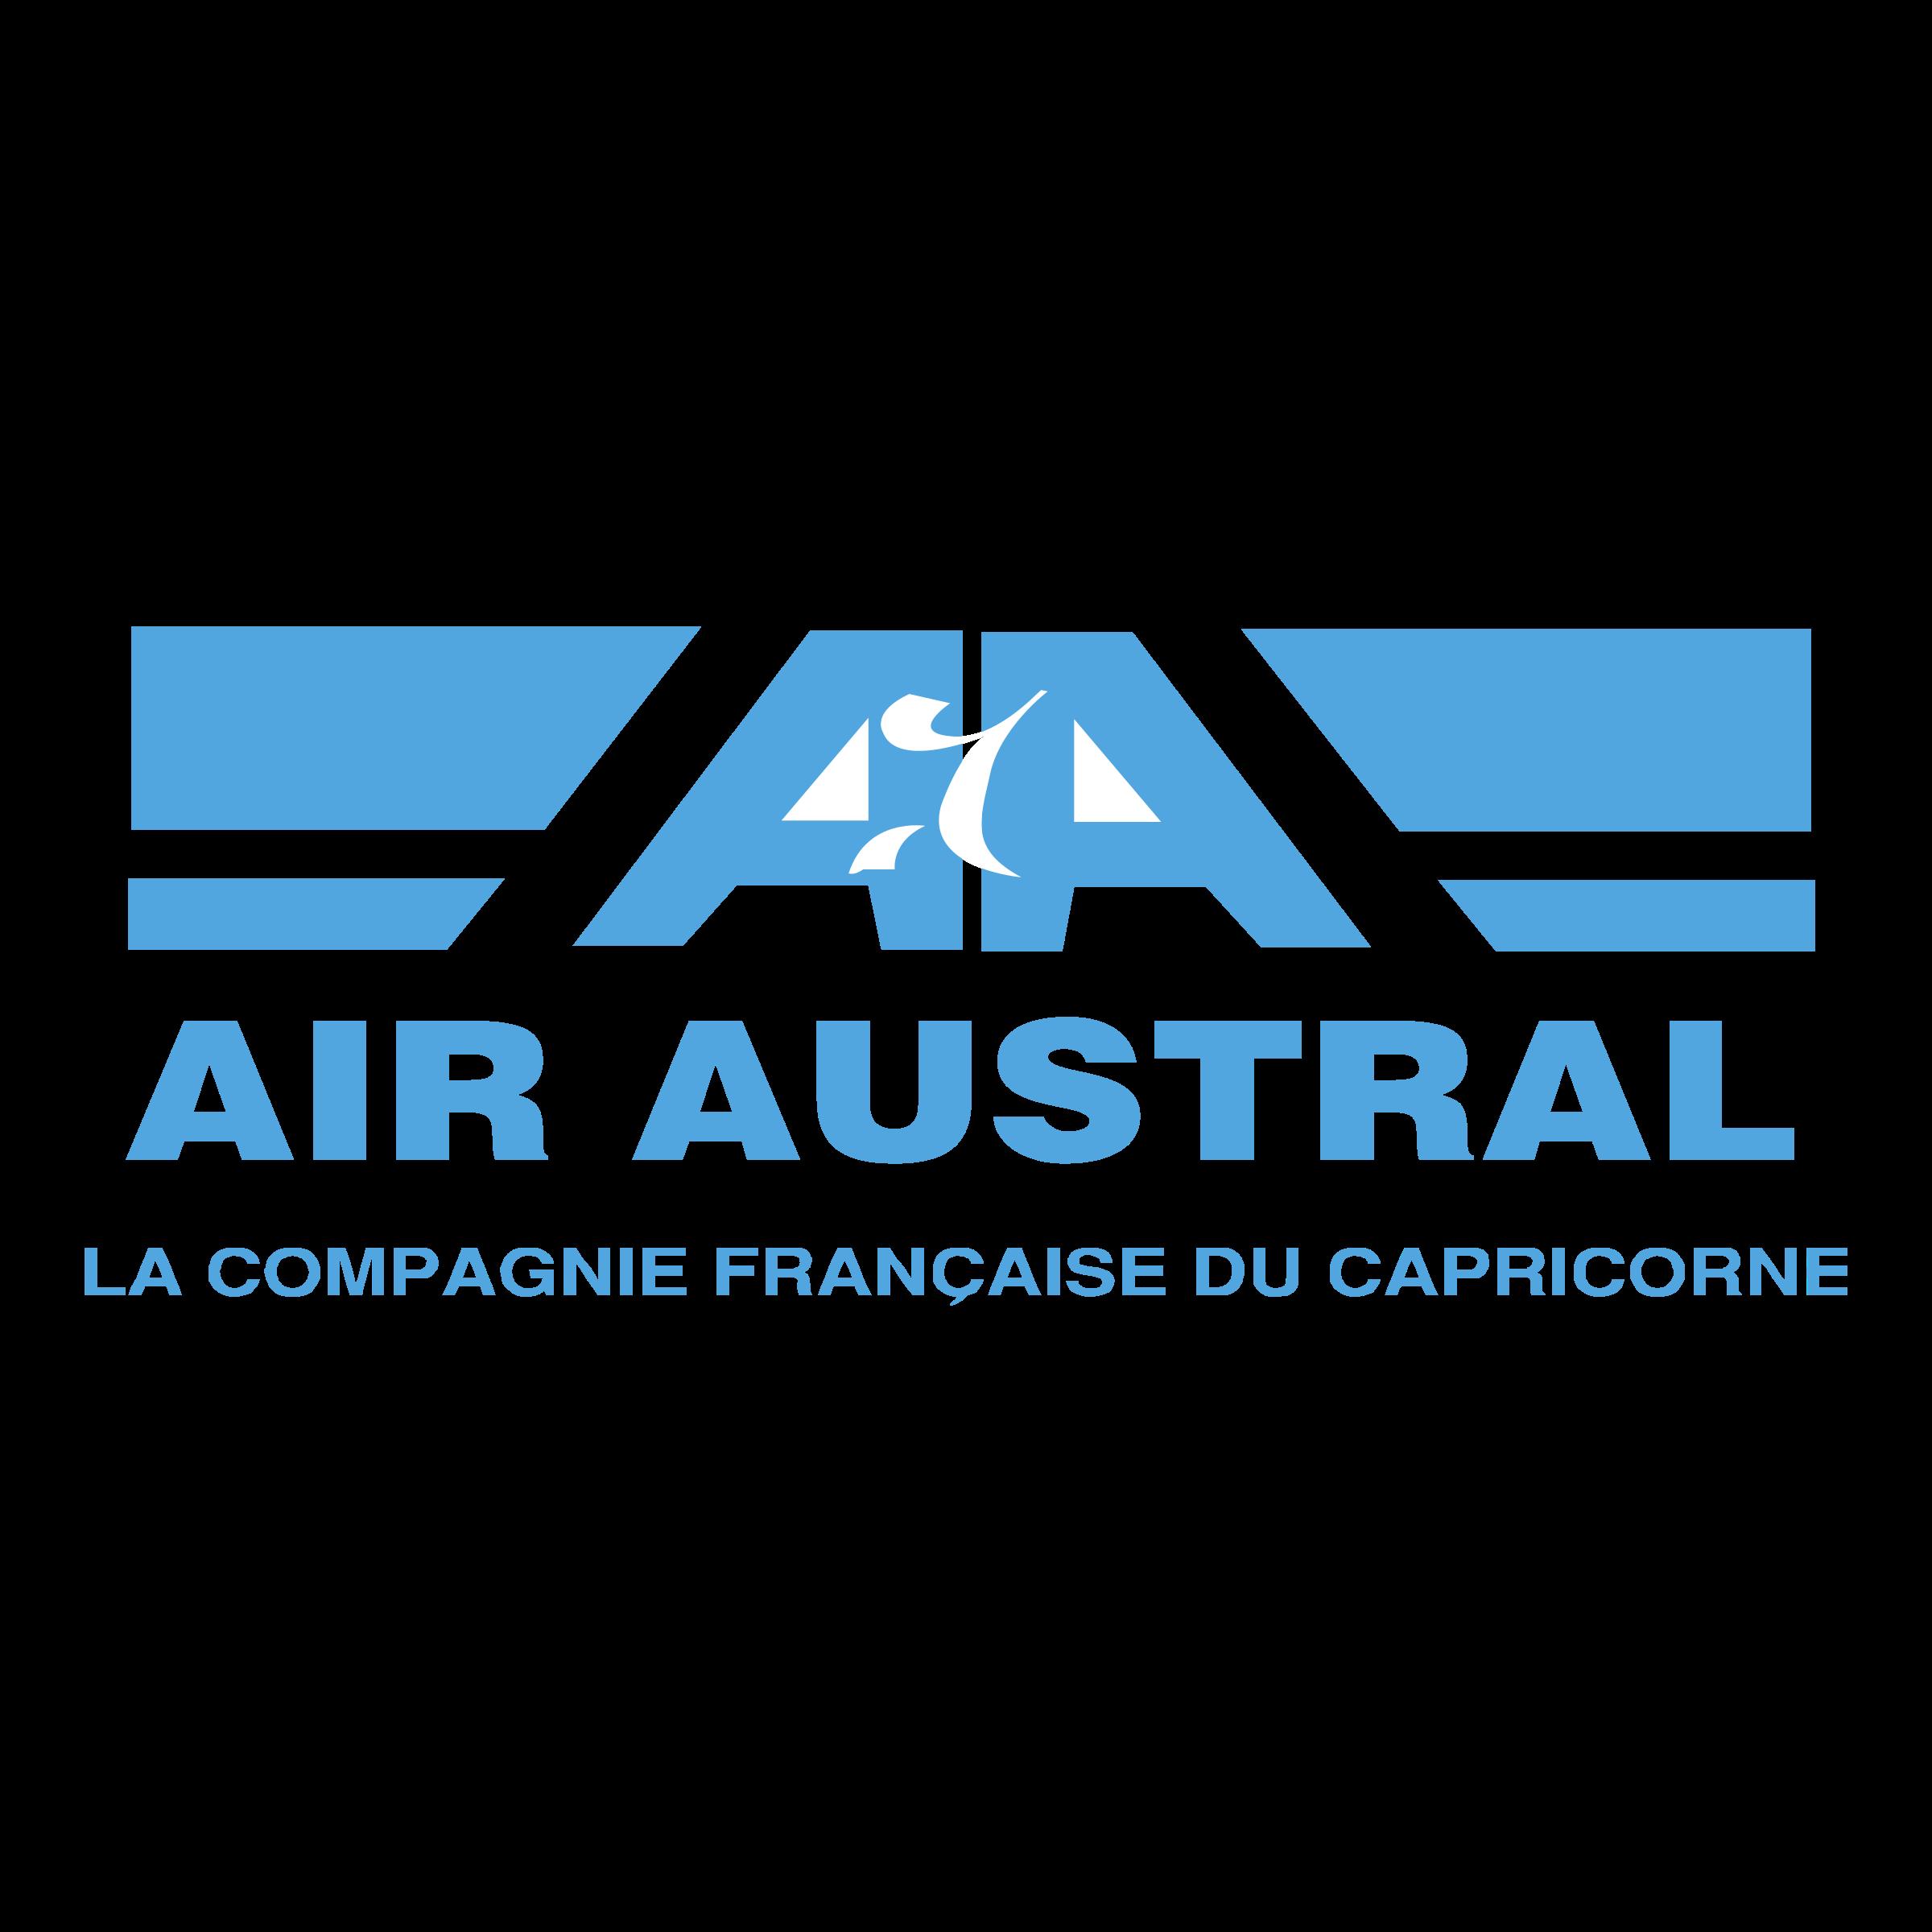 Air Austral Logo PNG Transparent & SVG Vector - Freebie Supply